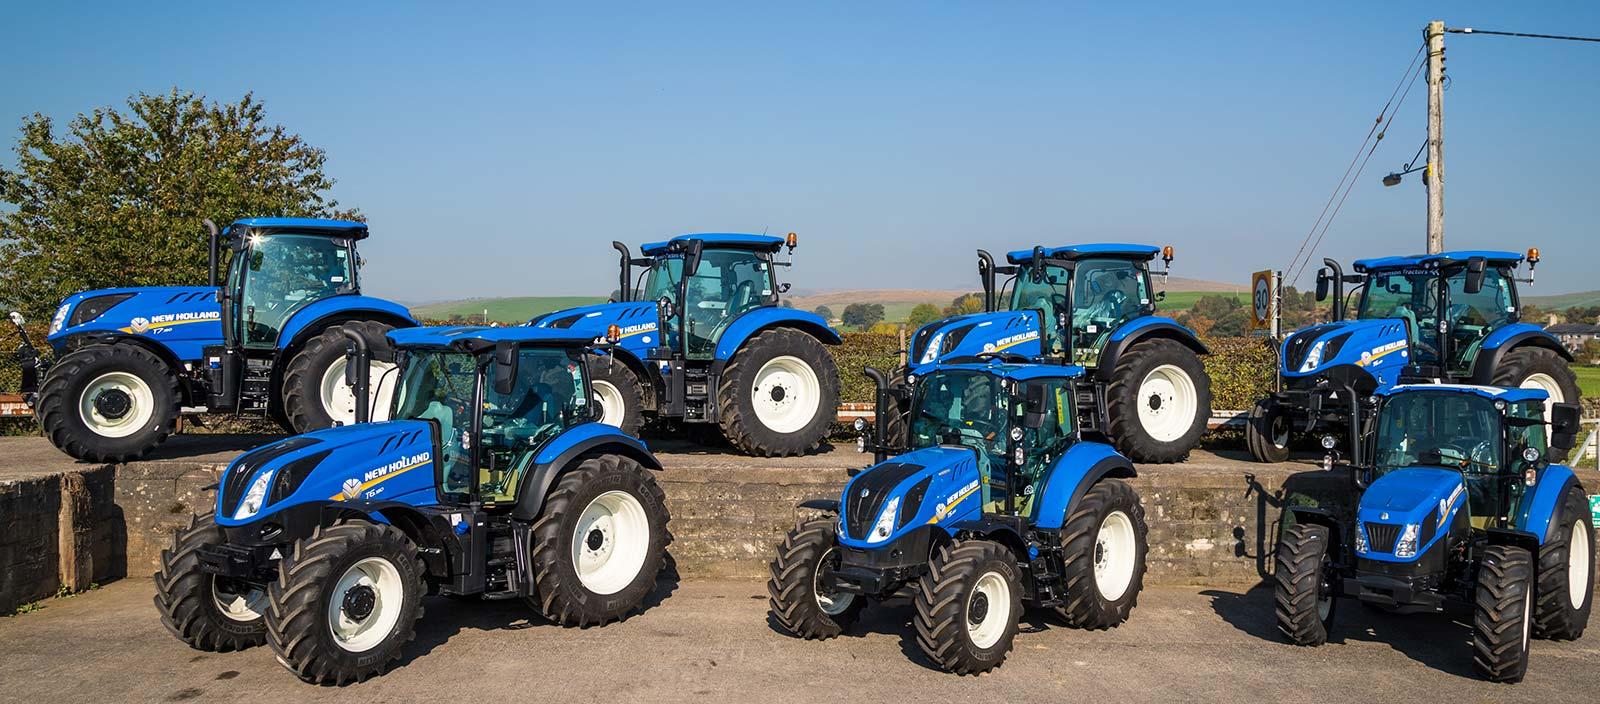 Home - Townson Tractors